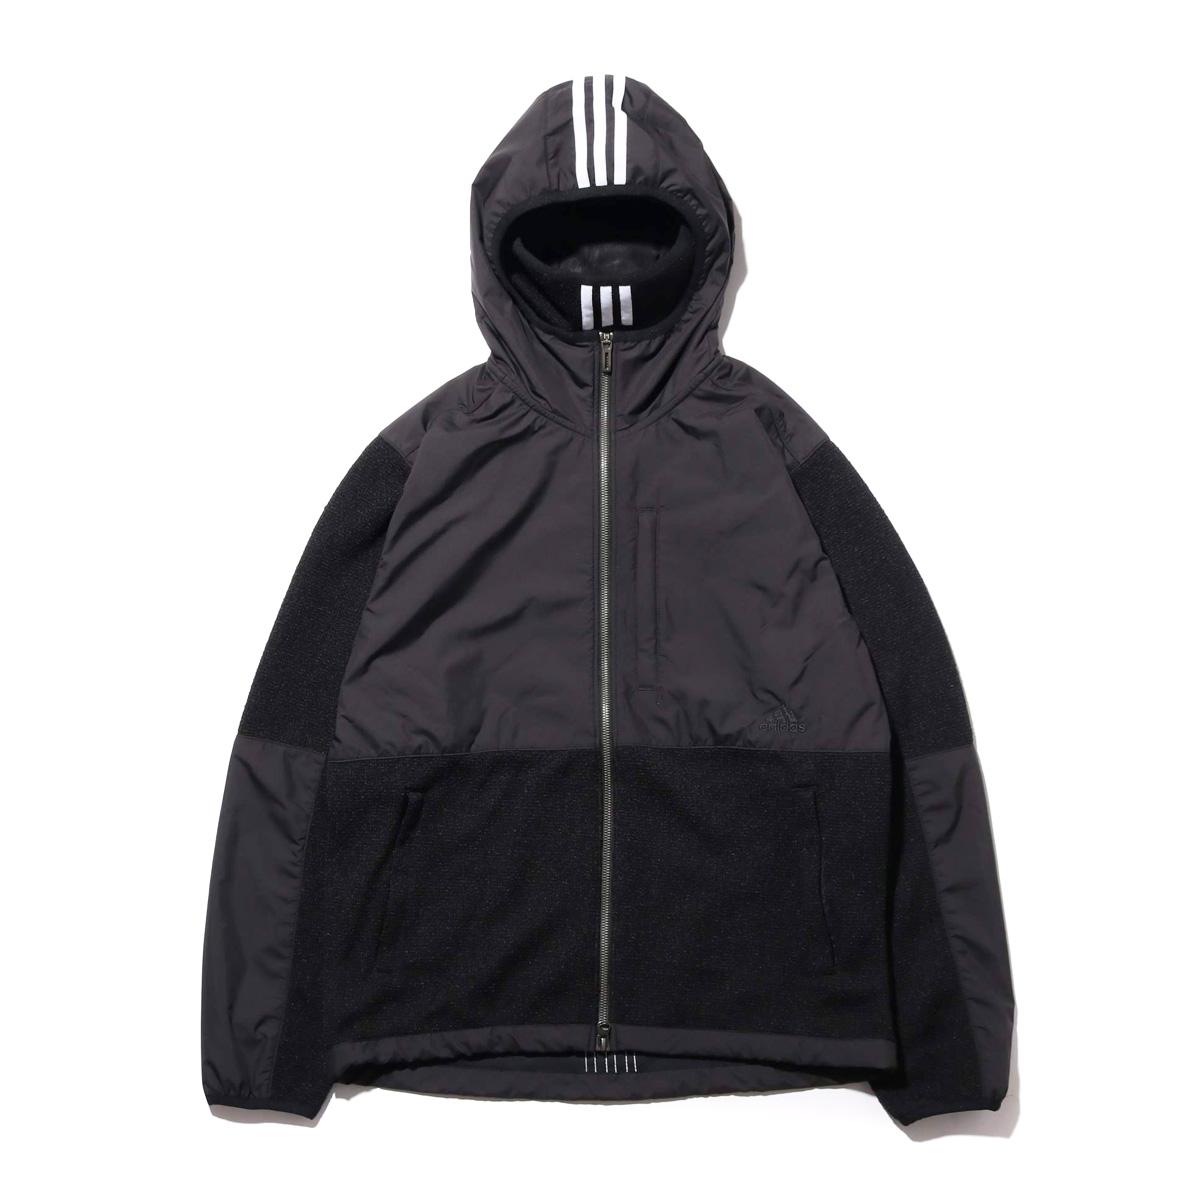 adidas M HB JK(BLACK)(アディダス M HB JK)【メンズ】【ジャケット】【18FW-S】